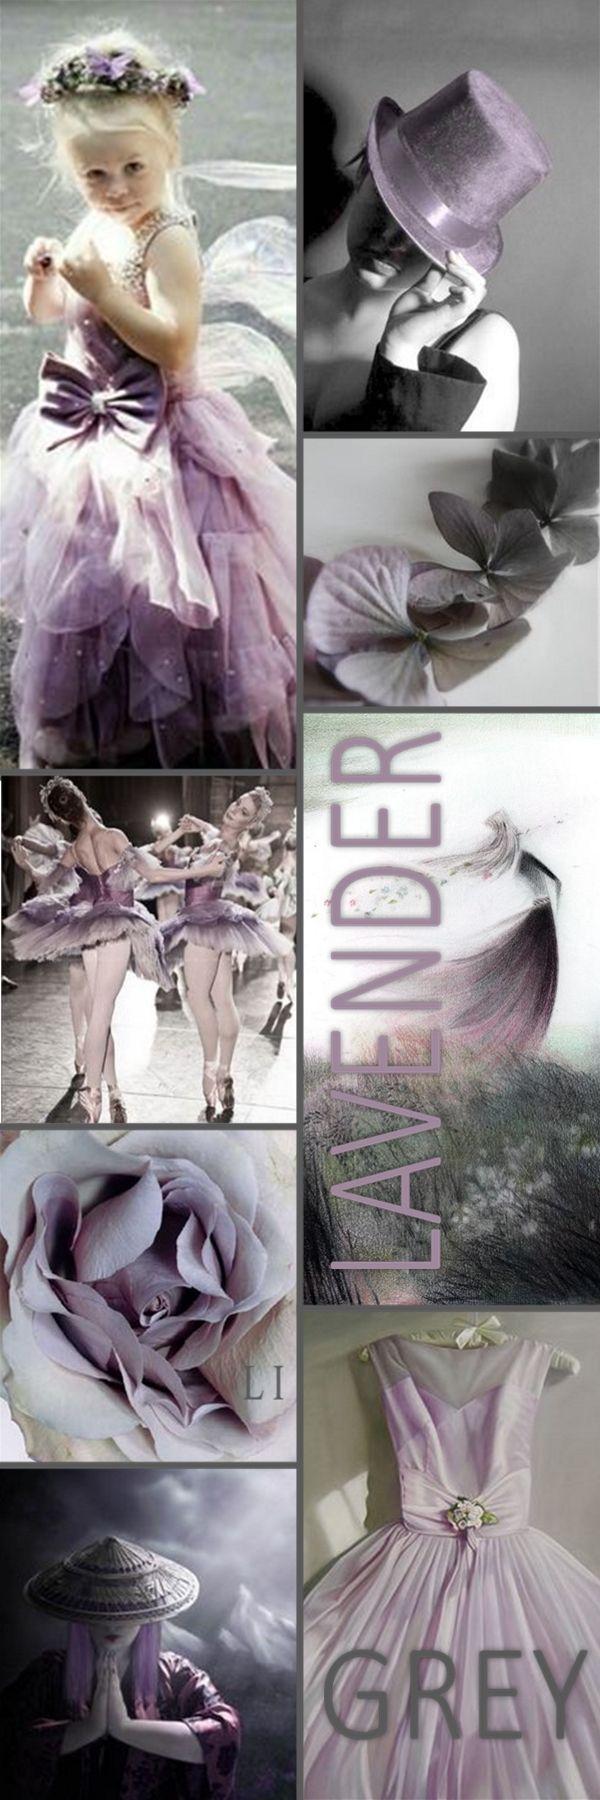 Lu's Inspiration ღ